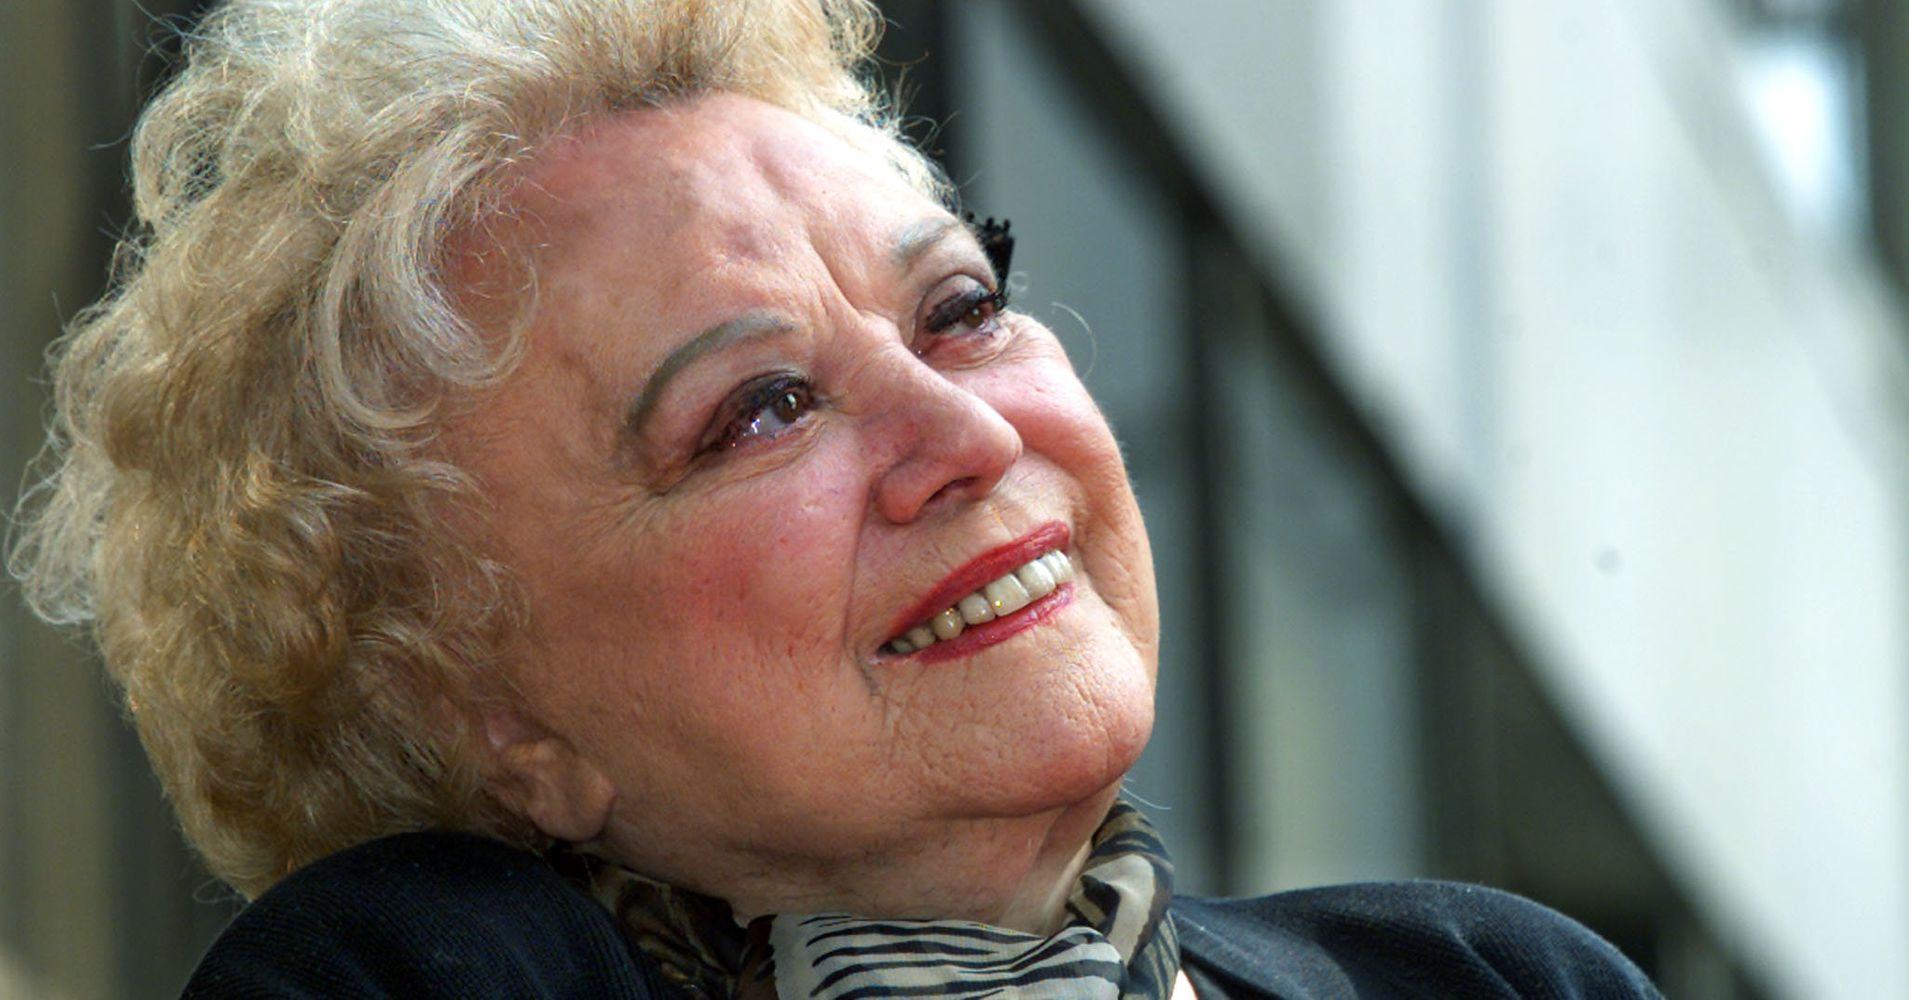 'Dick Van Dyke' Cast Member Rose Marie Dead At 94